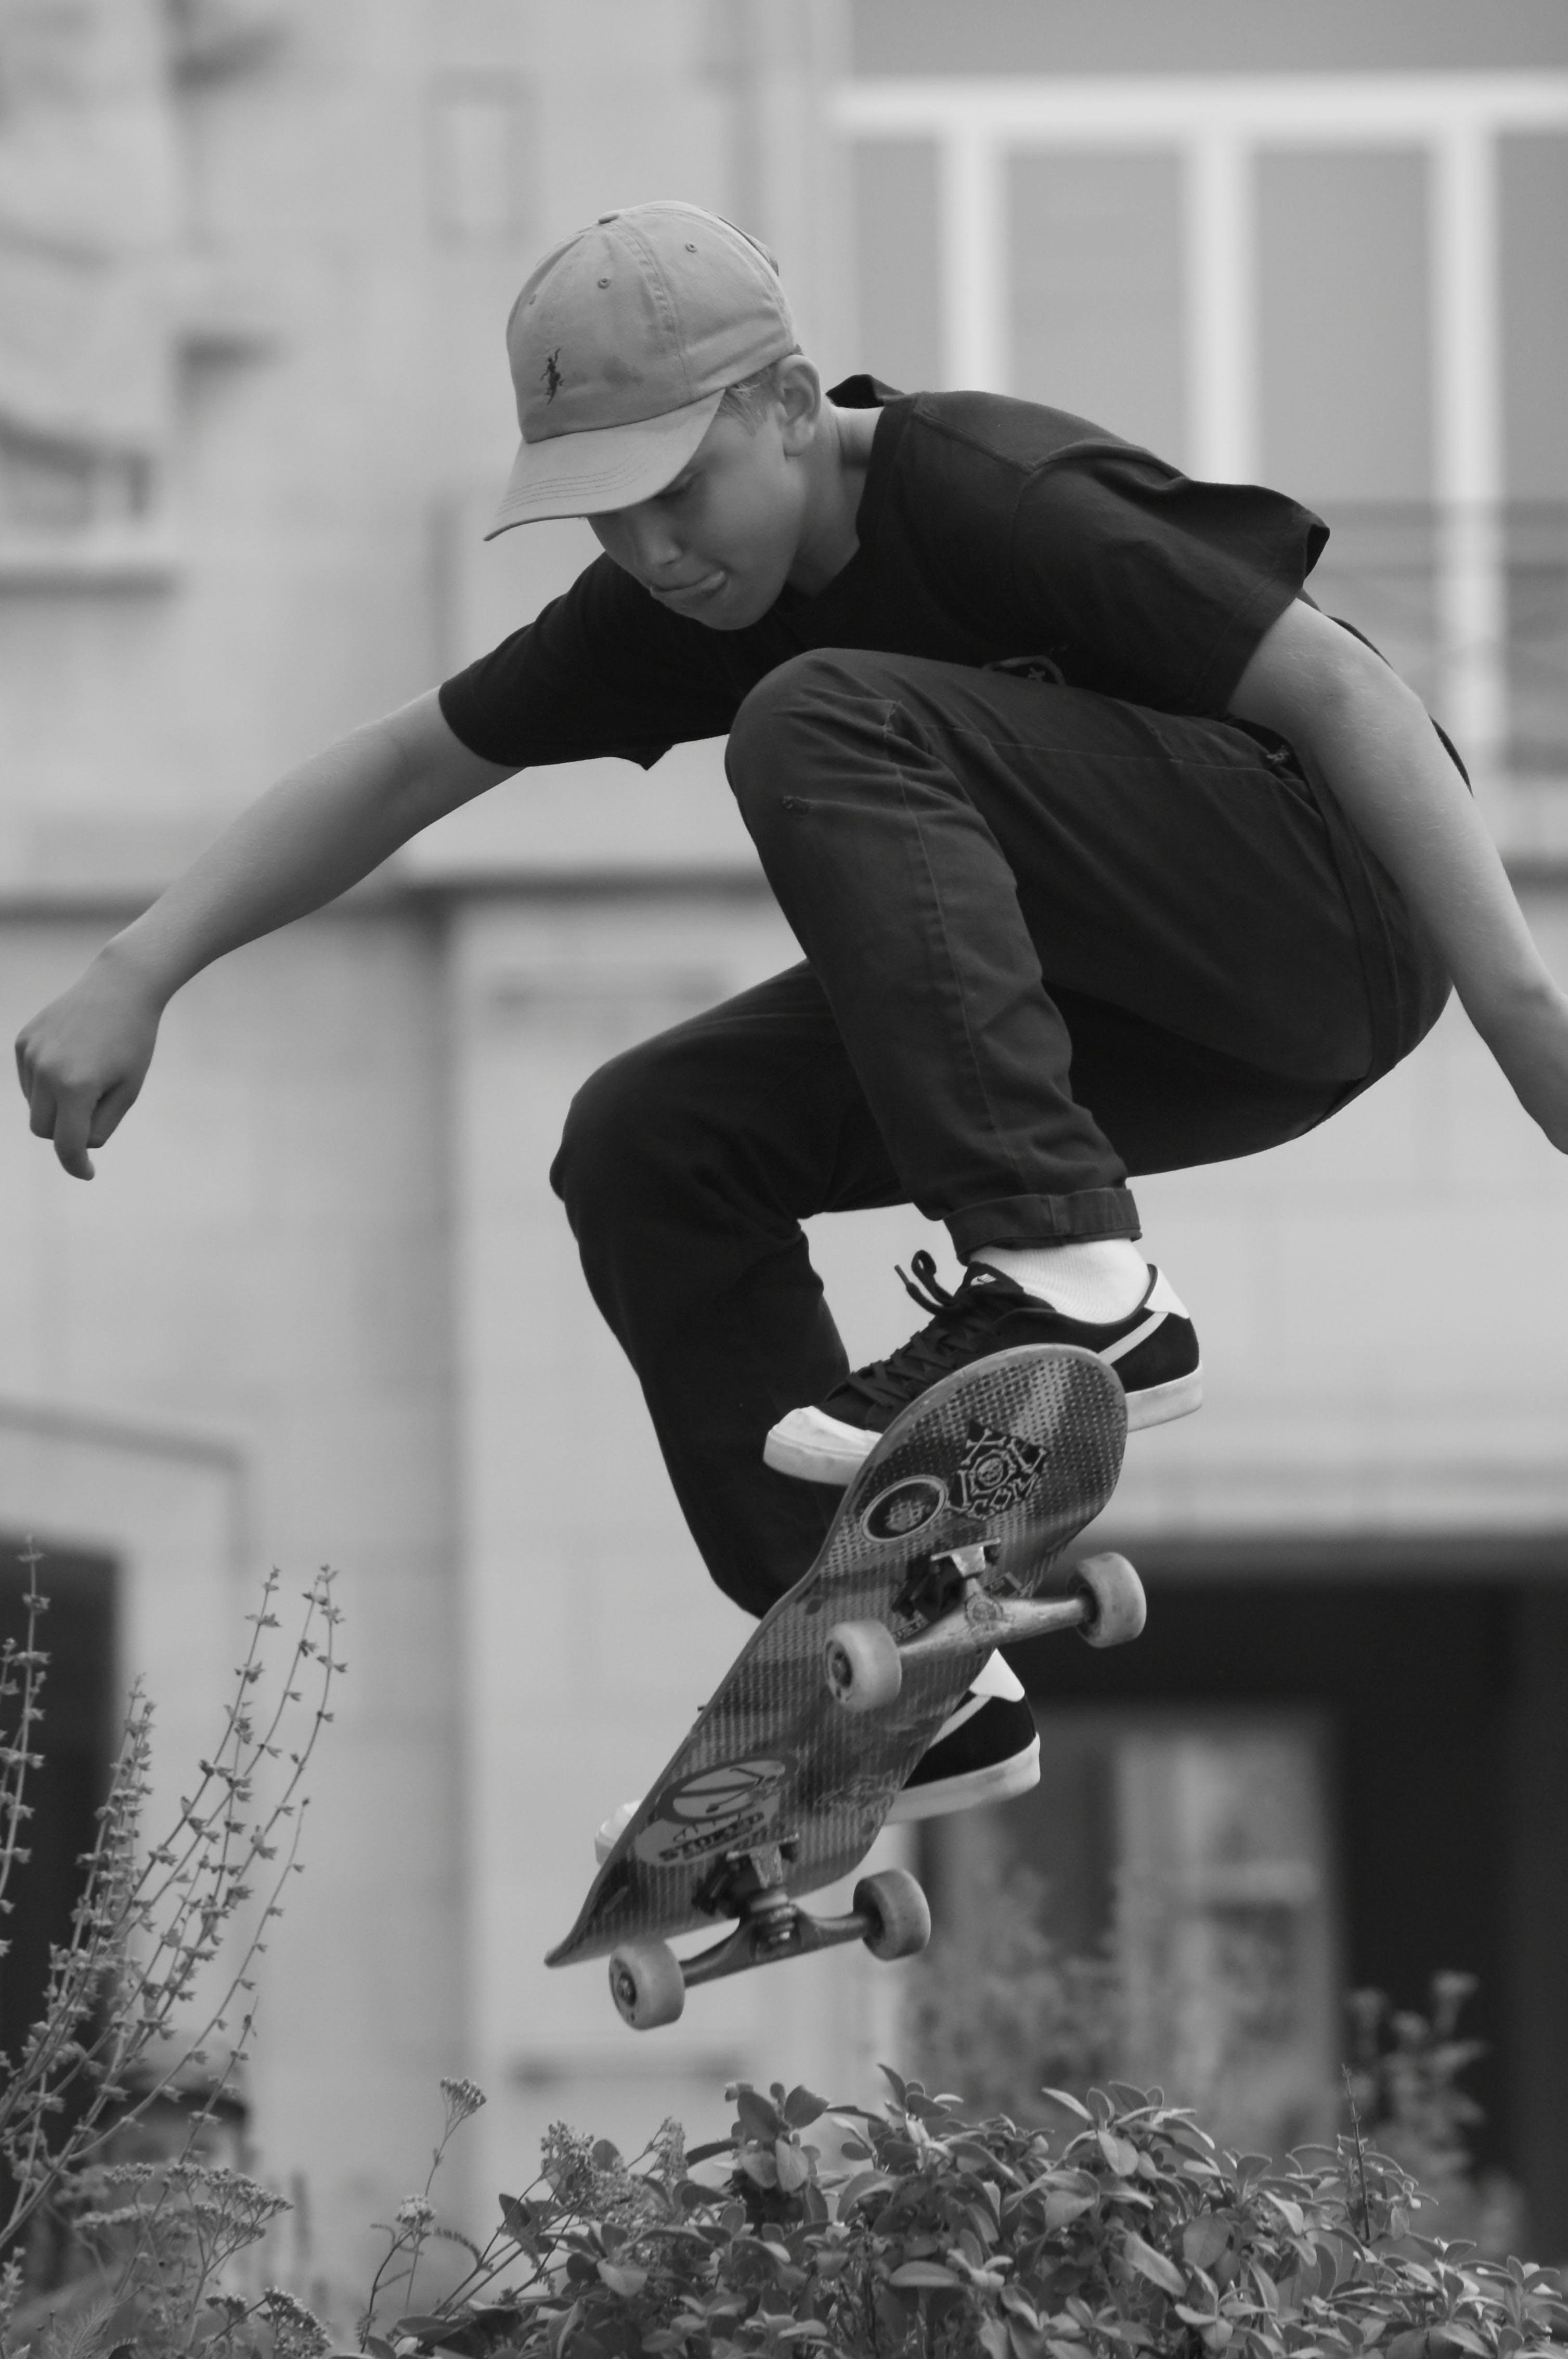 Kostenloses Stock Foto zu action, balance, bewegung, cool